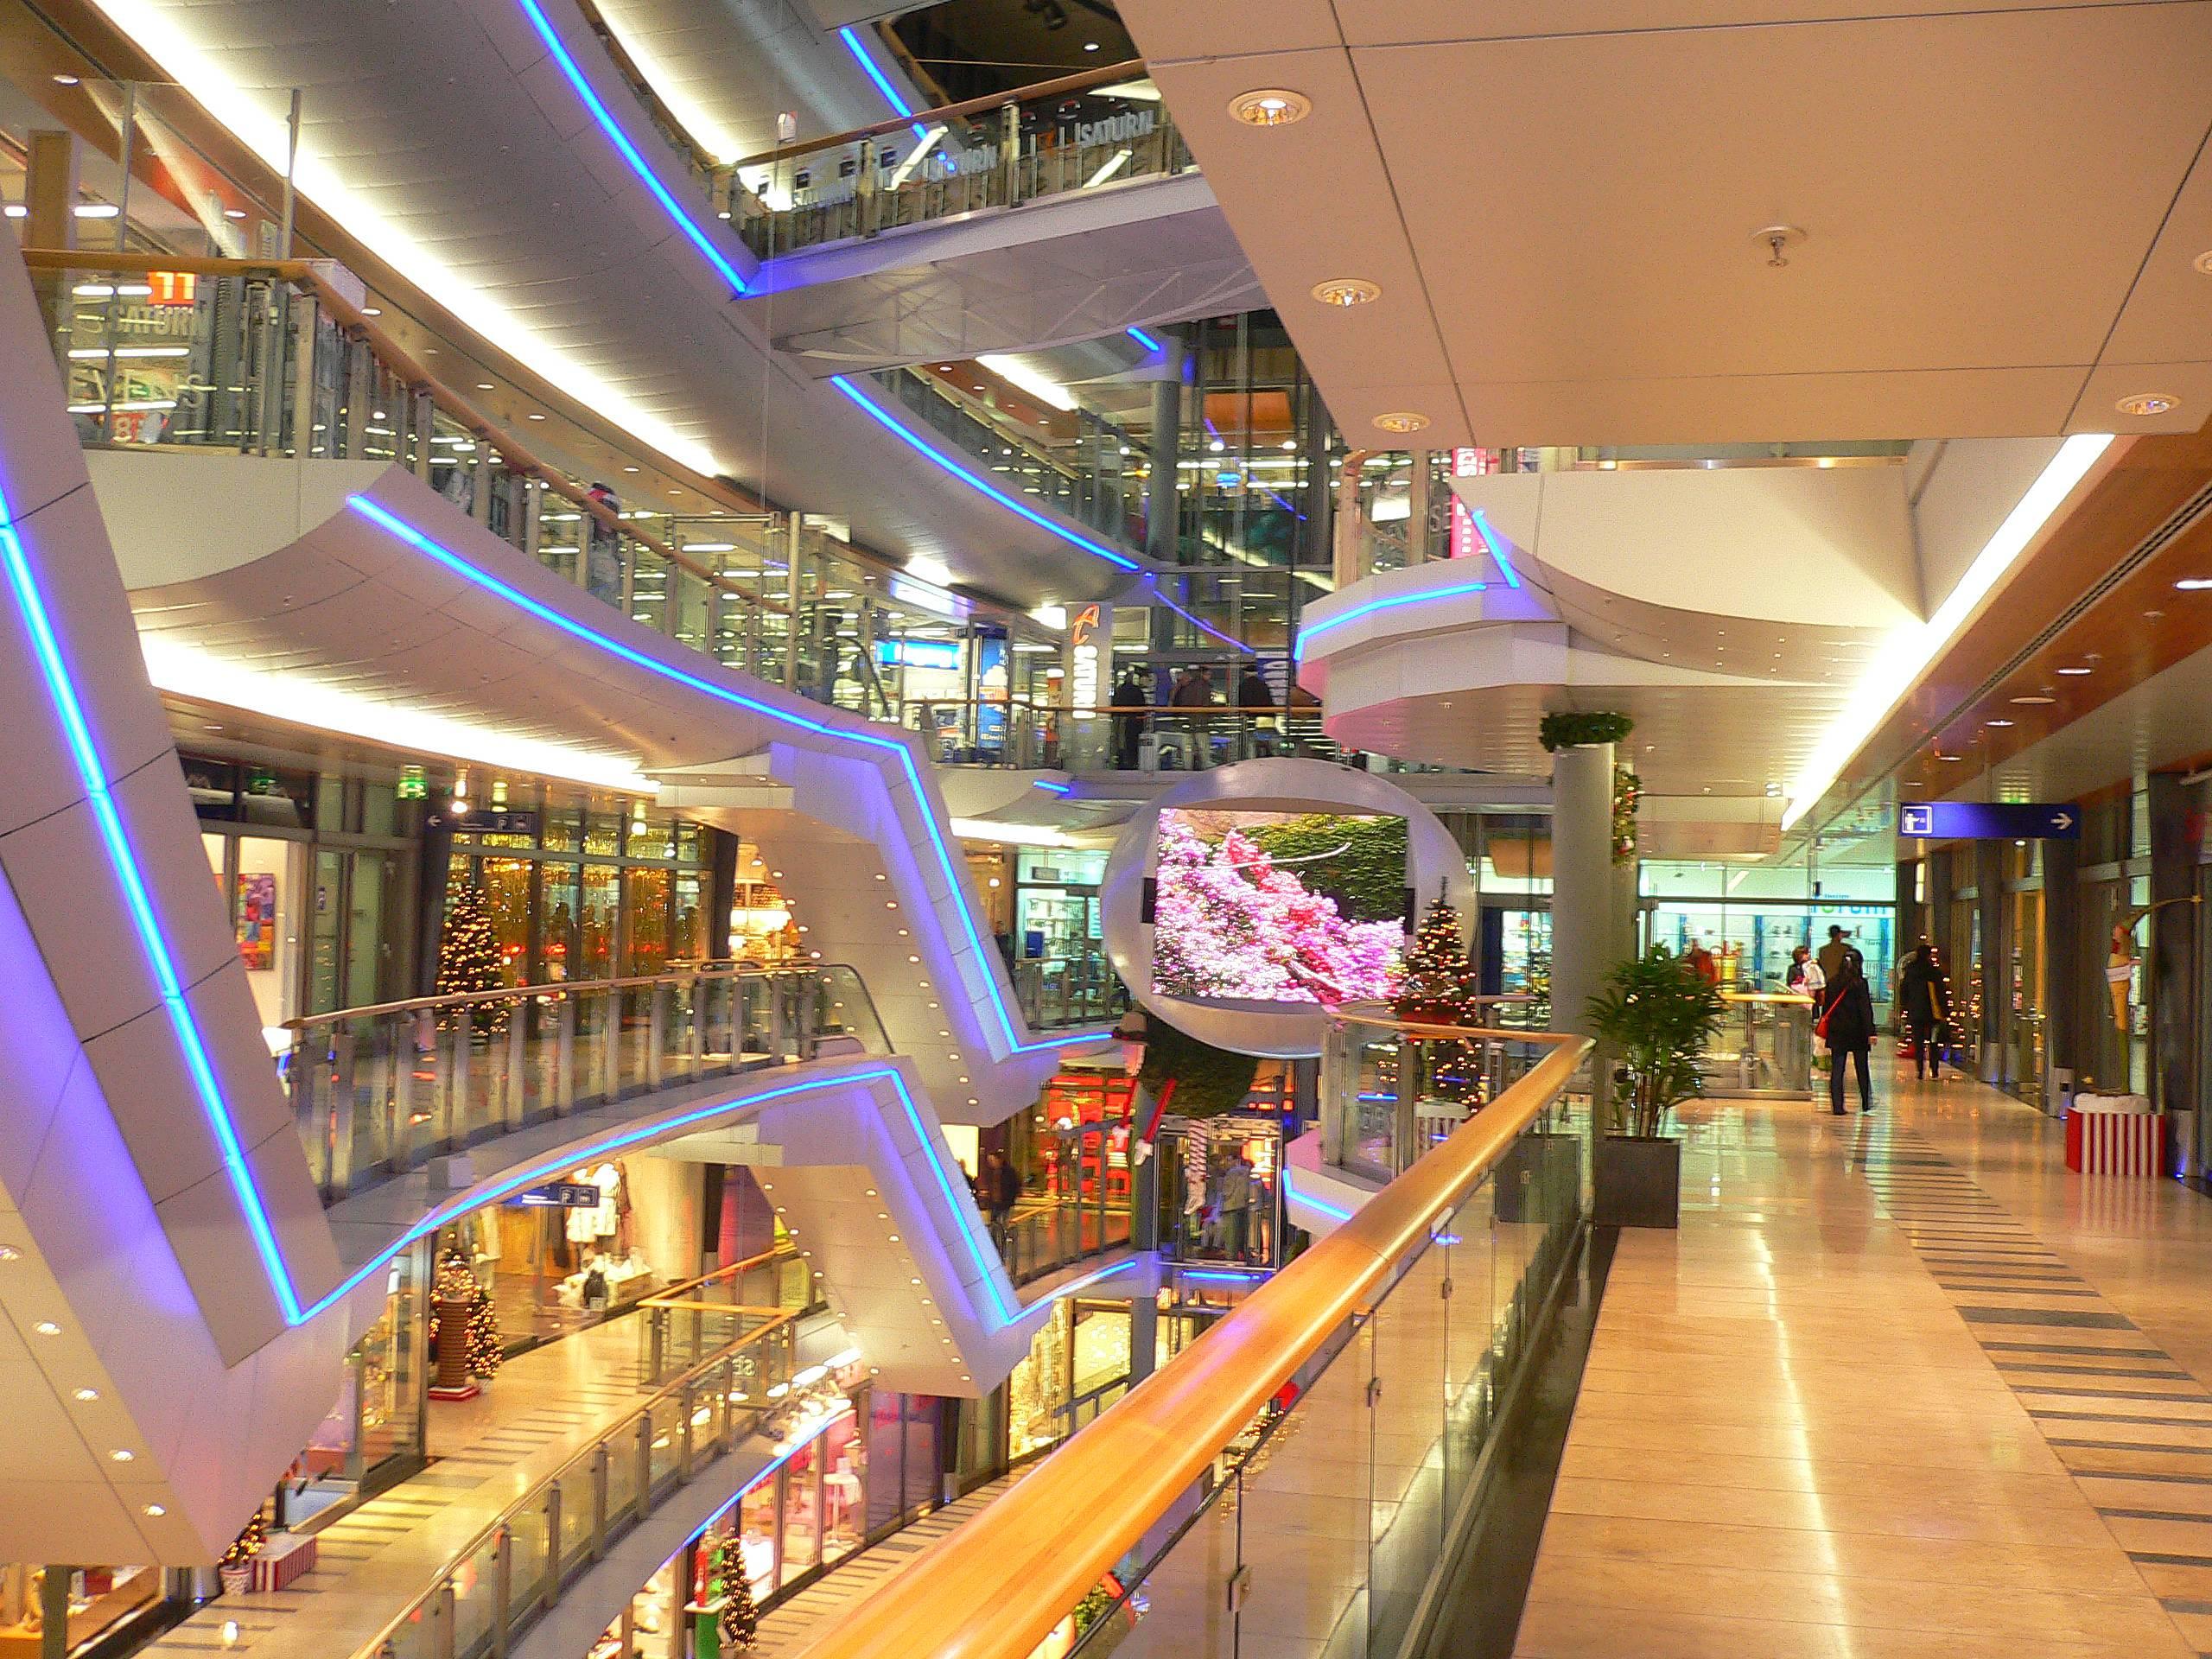 Mahanagar Palira Shopping Complex